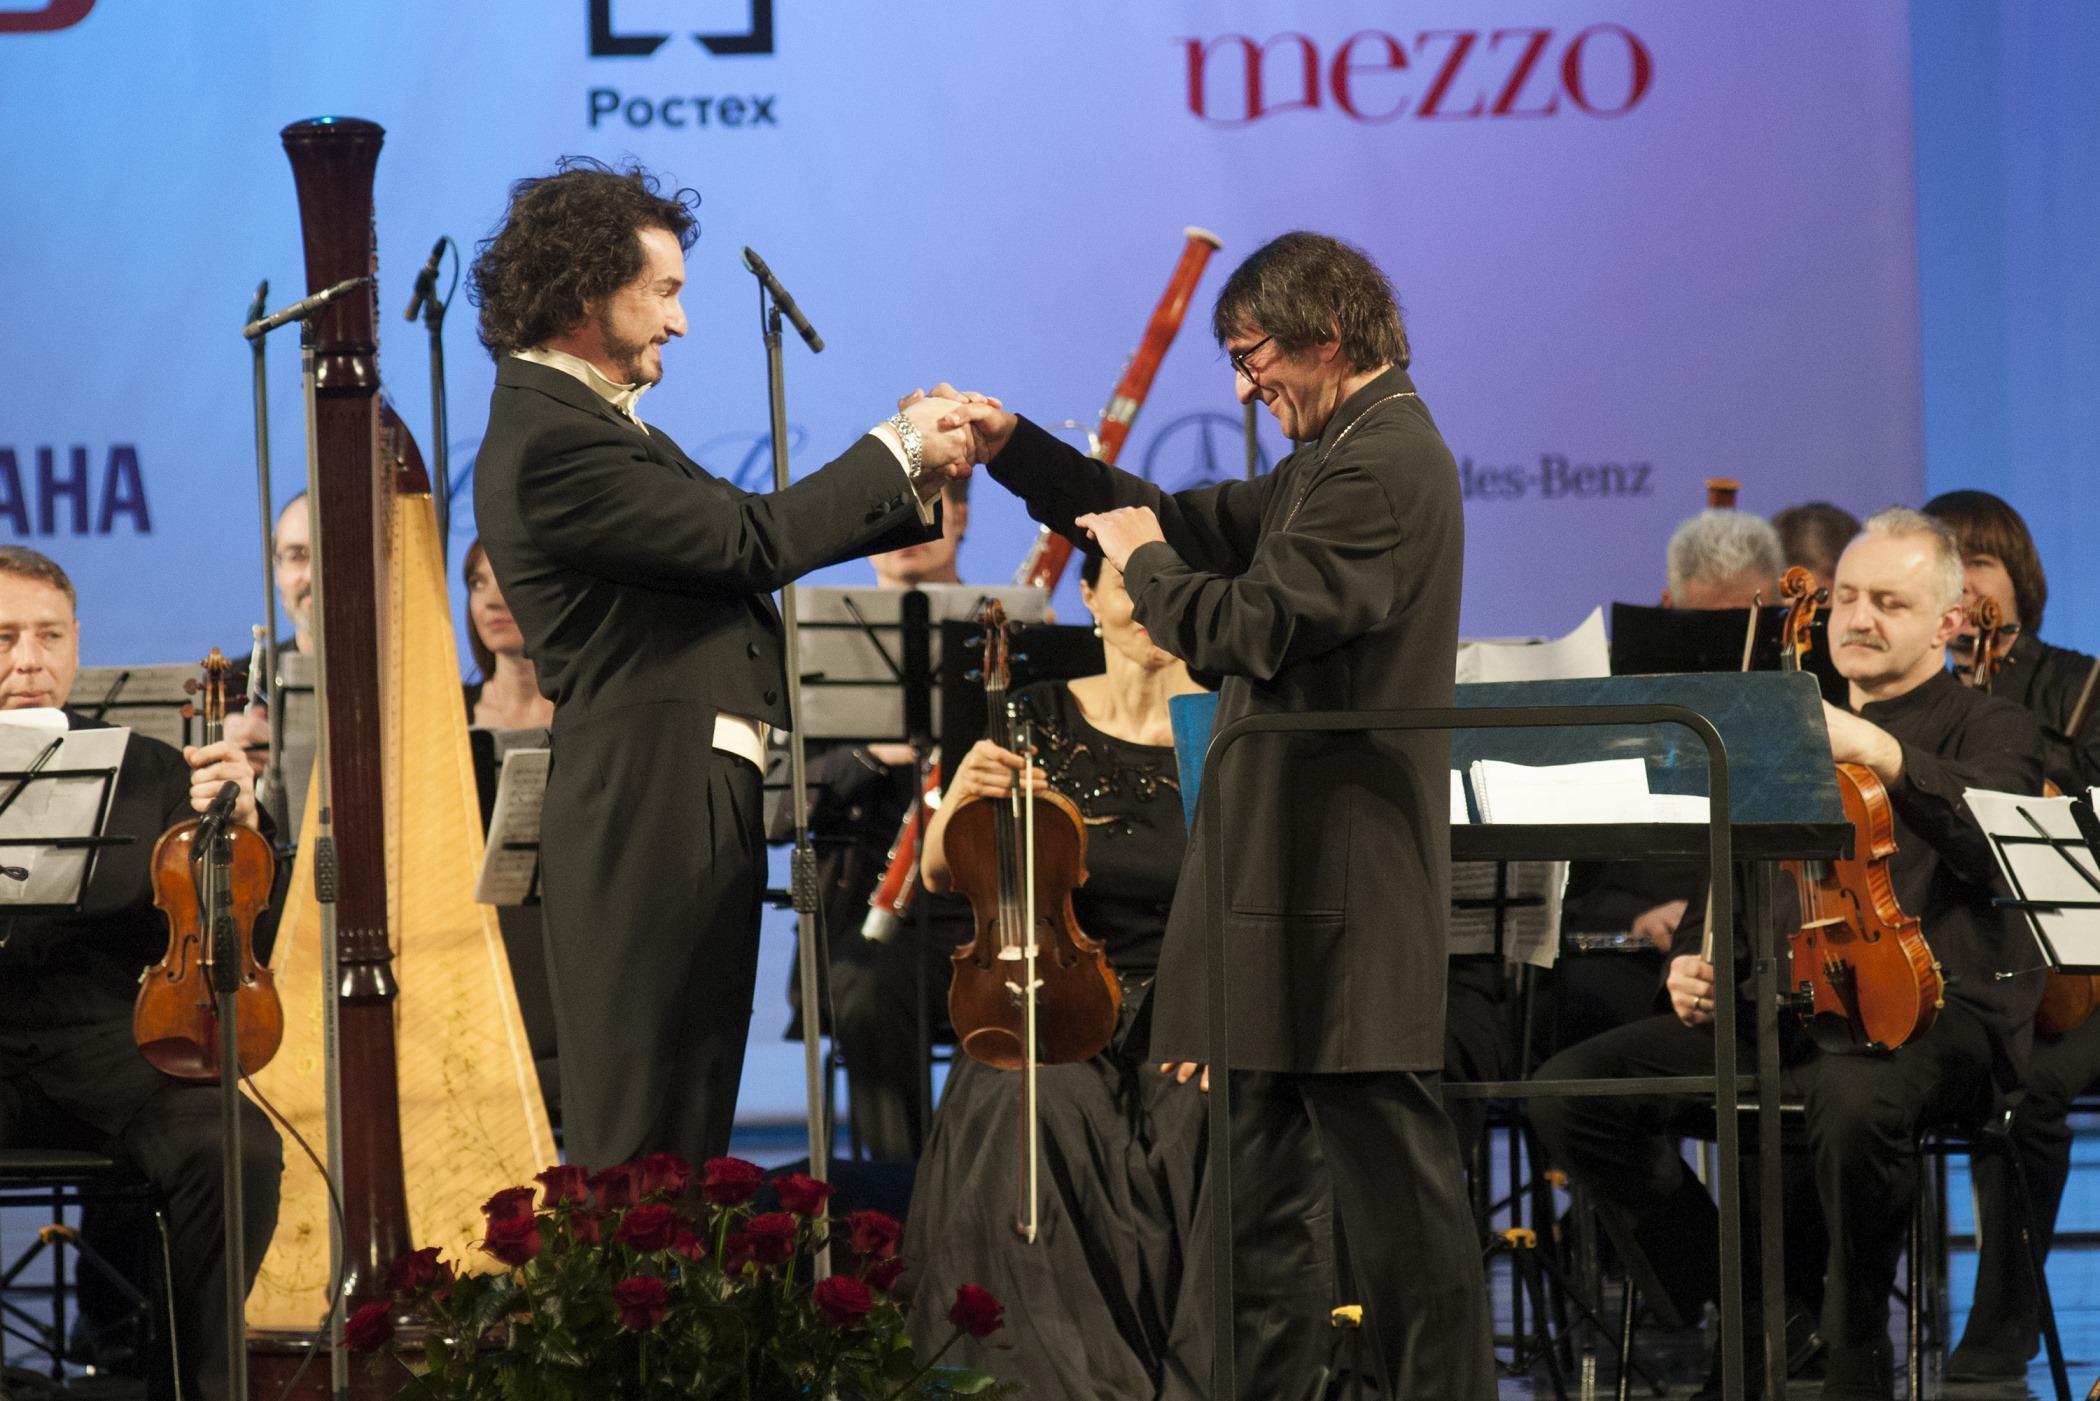 Gabriele_Nani with Yuri_Bashmet_.jpg